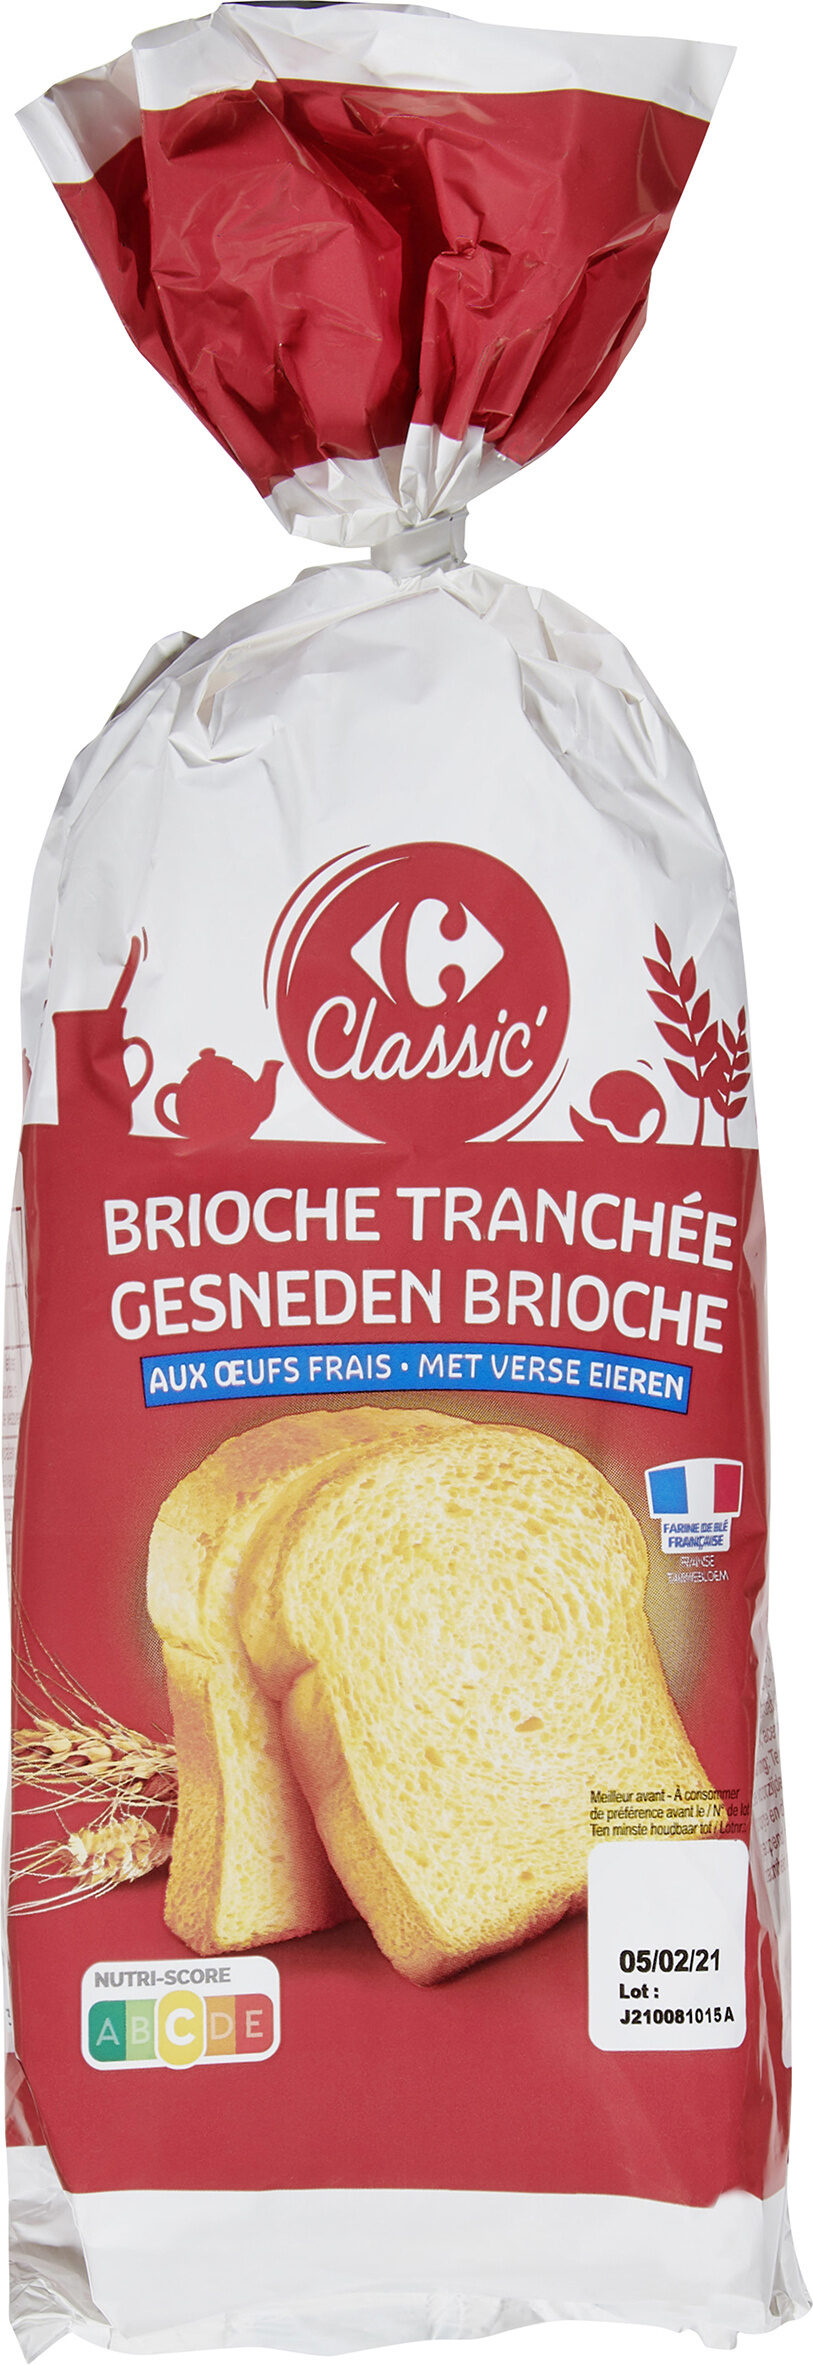 Brioche Tranchée - Product - fr